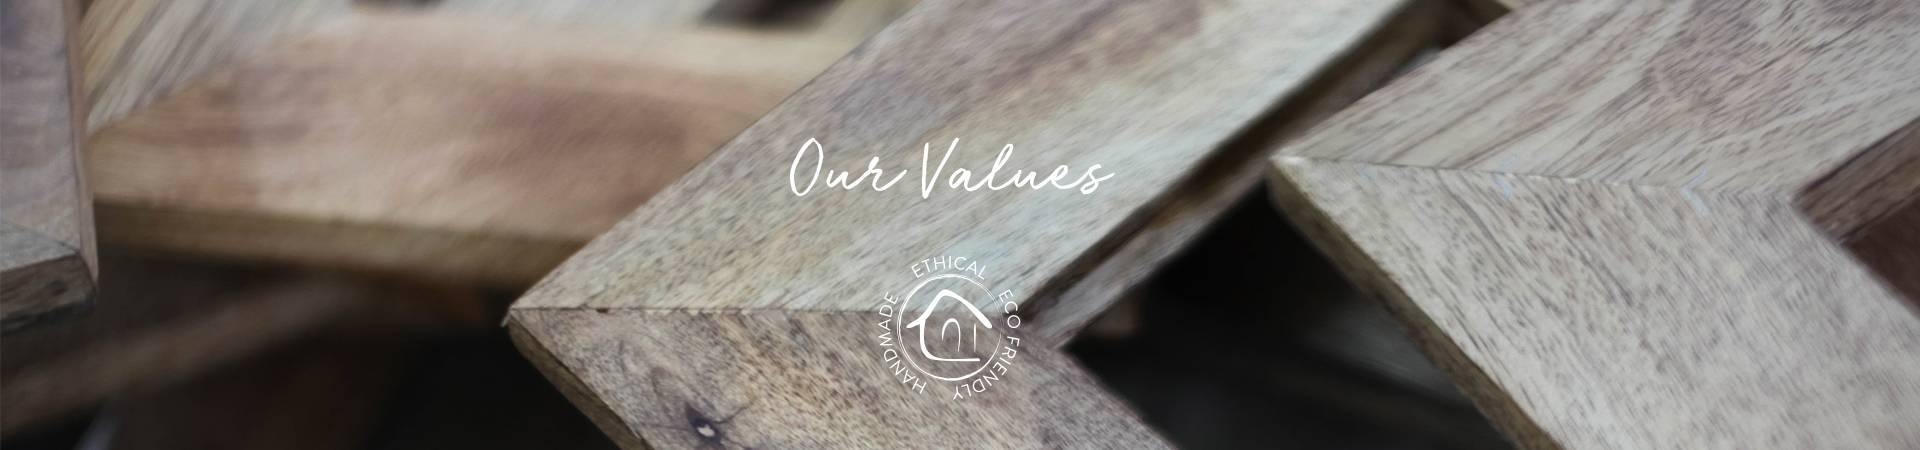 Our Values_desktop.jpg